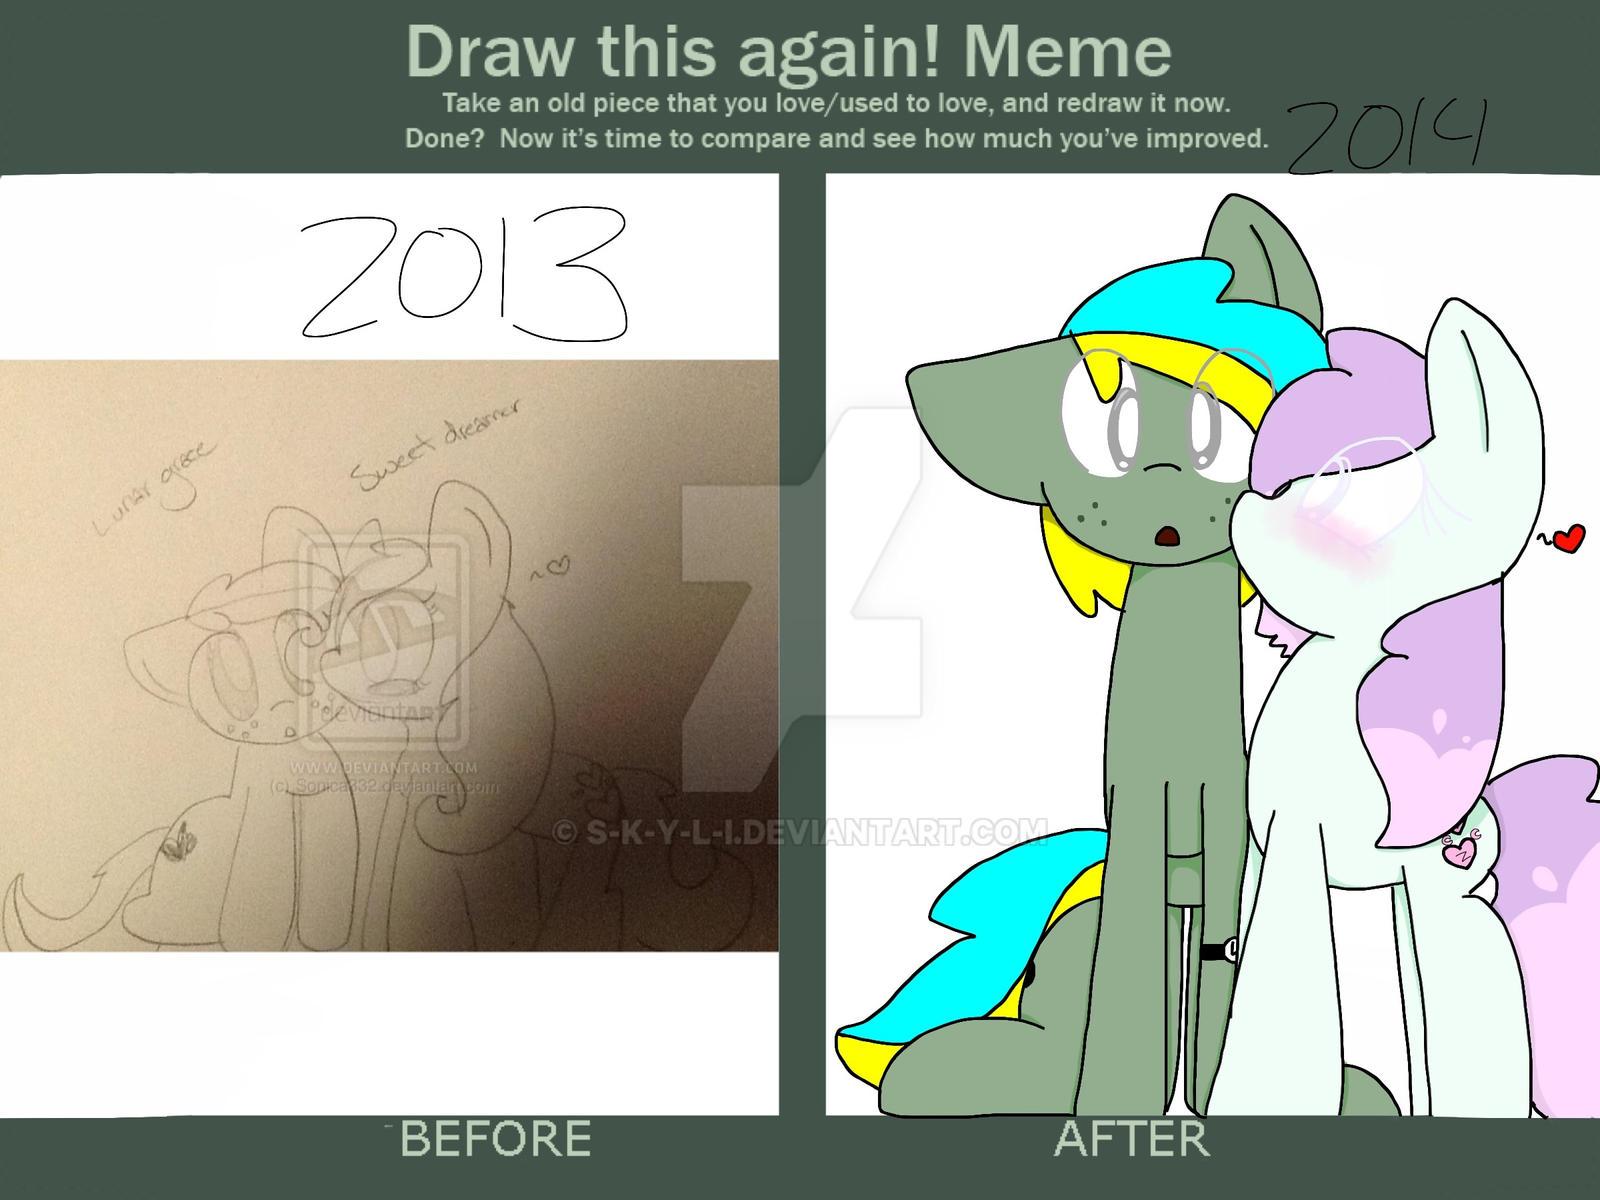 Draw this again meme by S-K-Y-L-I